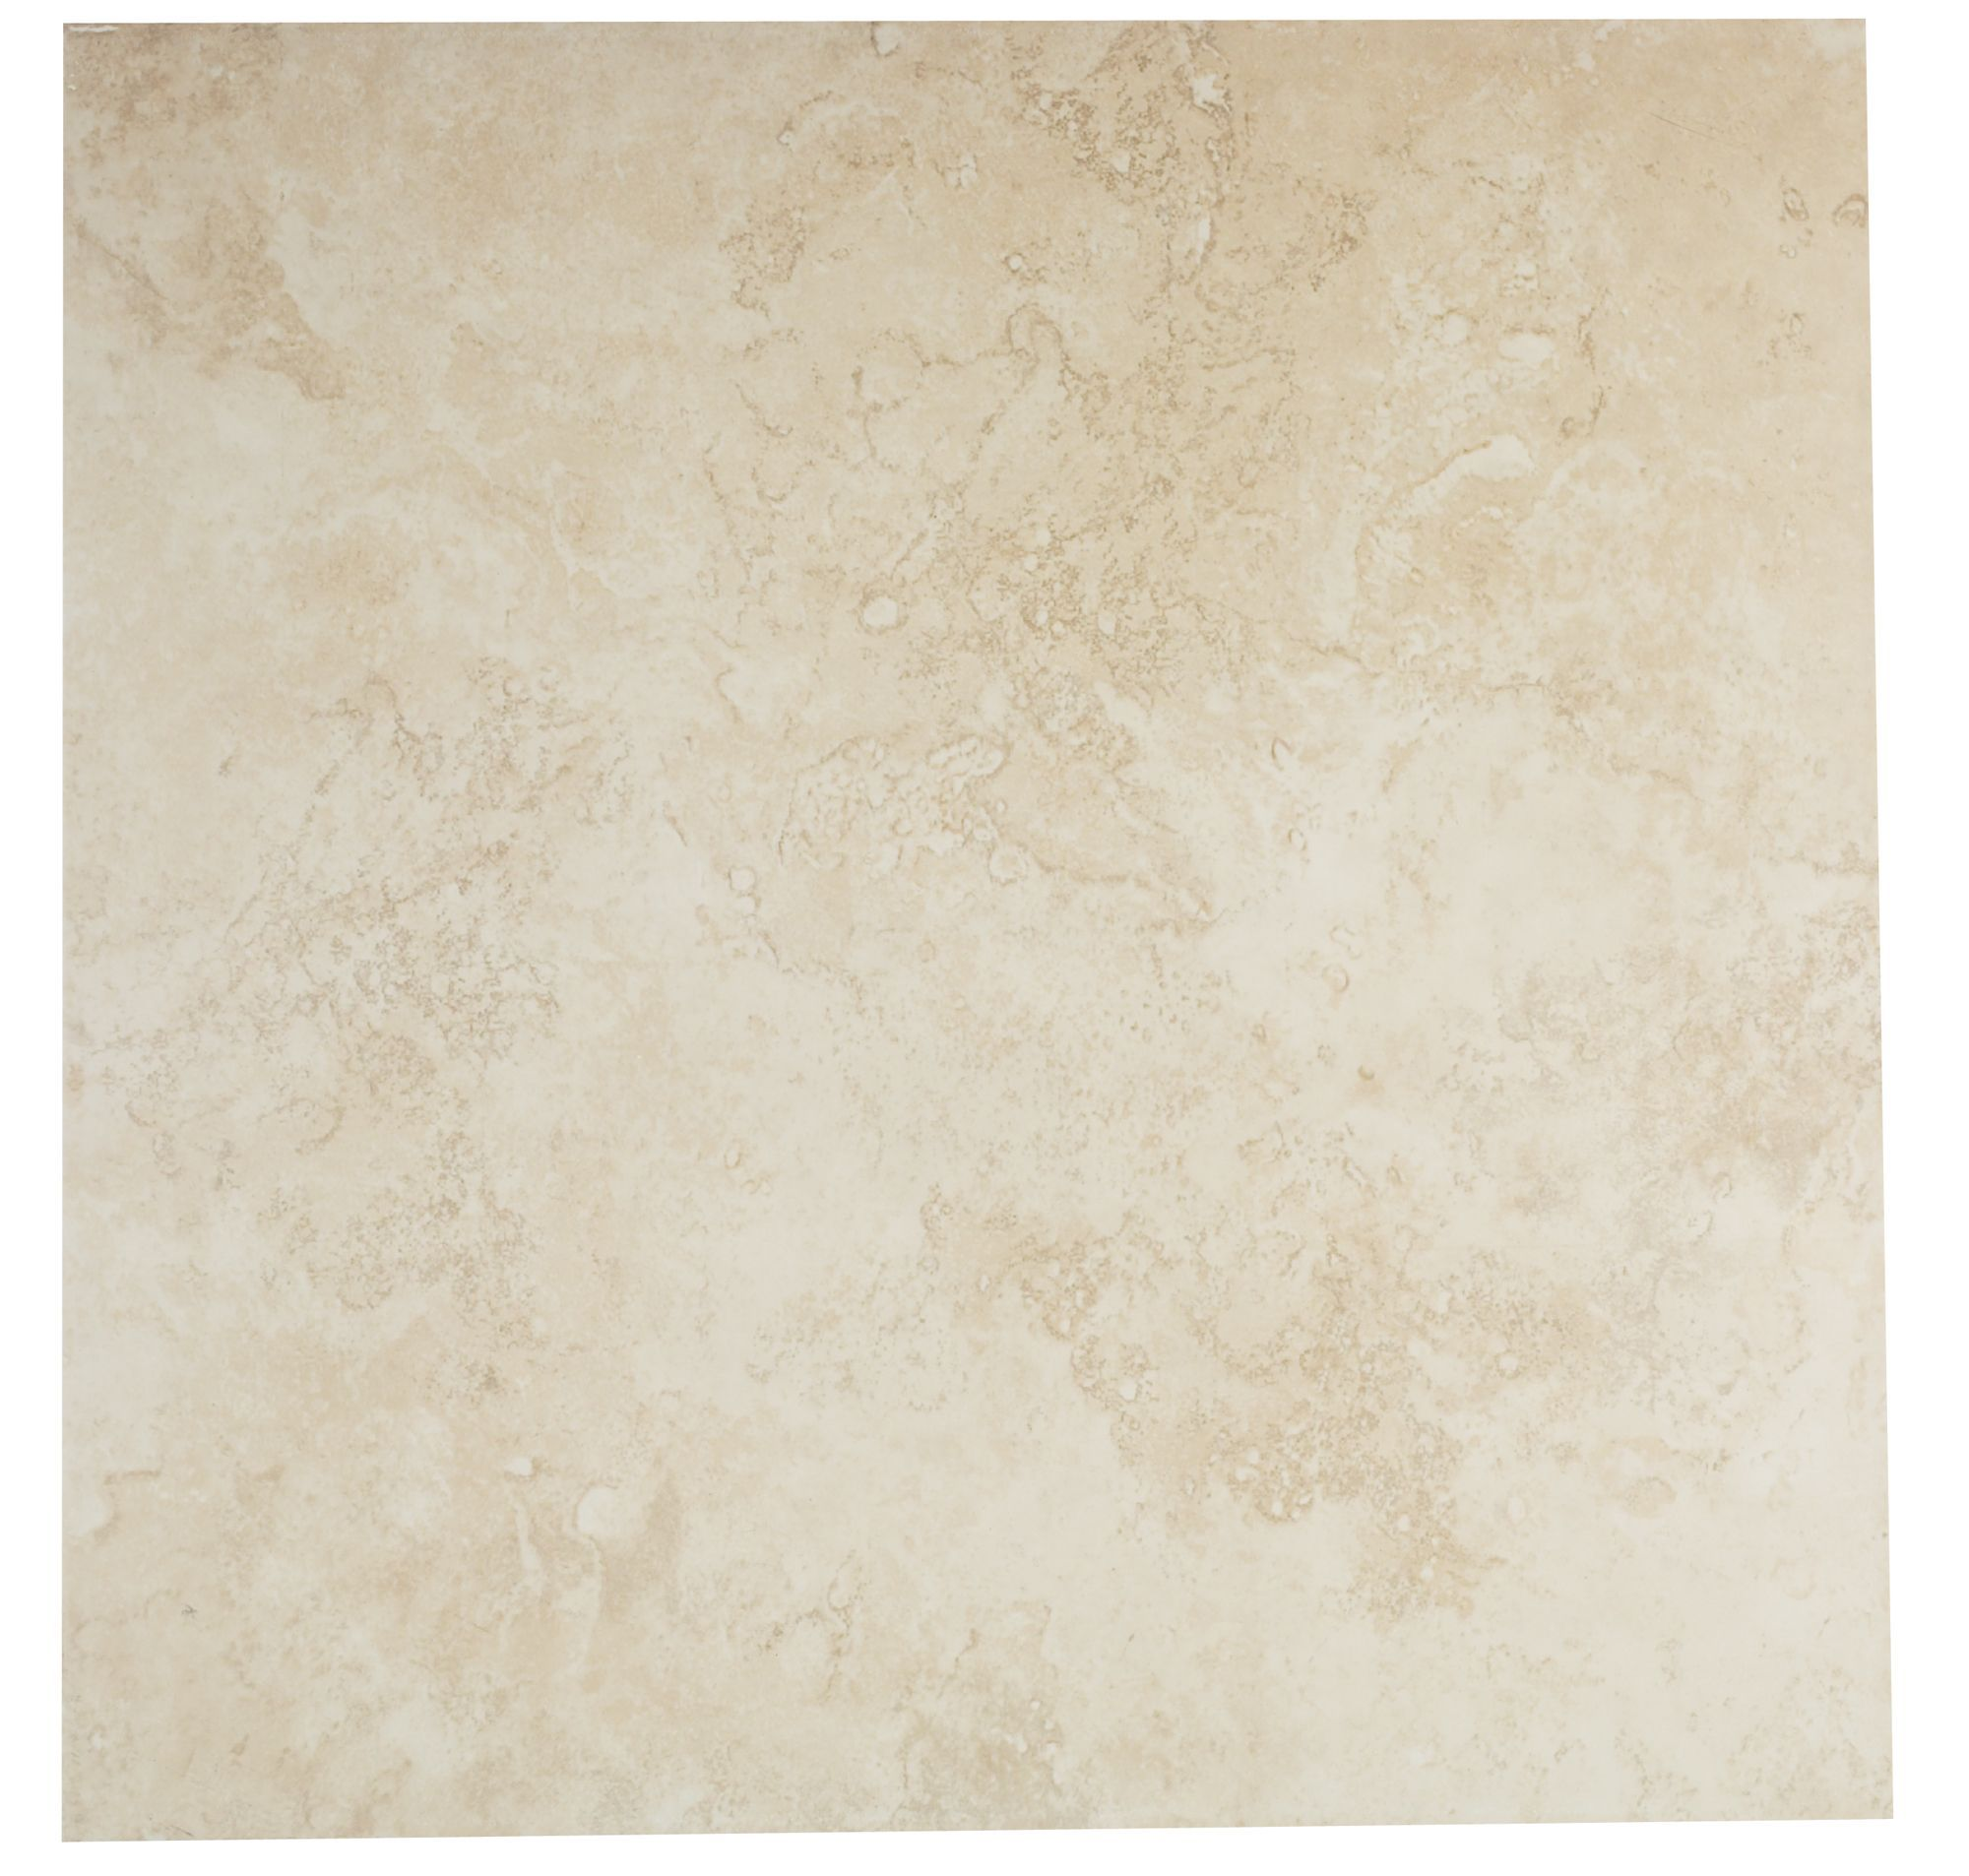 castle travertine cream ceramic wall floor tile pack of